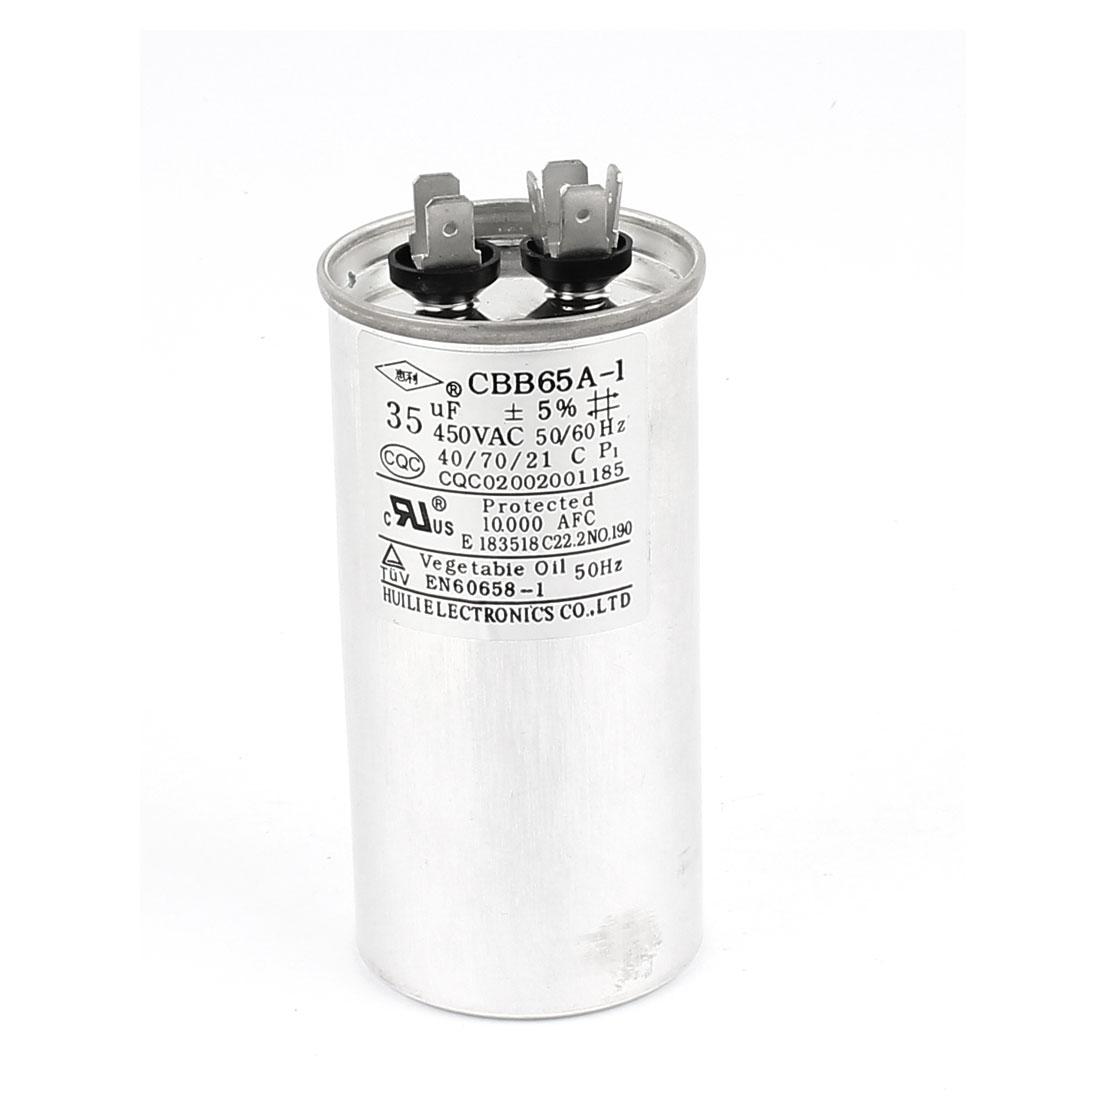 CBB65 AC 450V 35uF Polypropylene Motor Run Capacitor for Air Conditioner